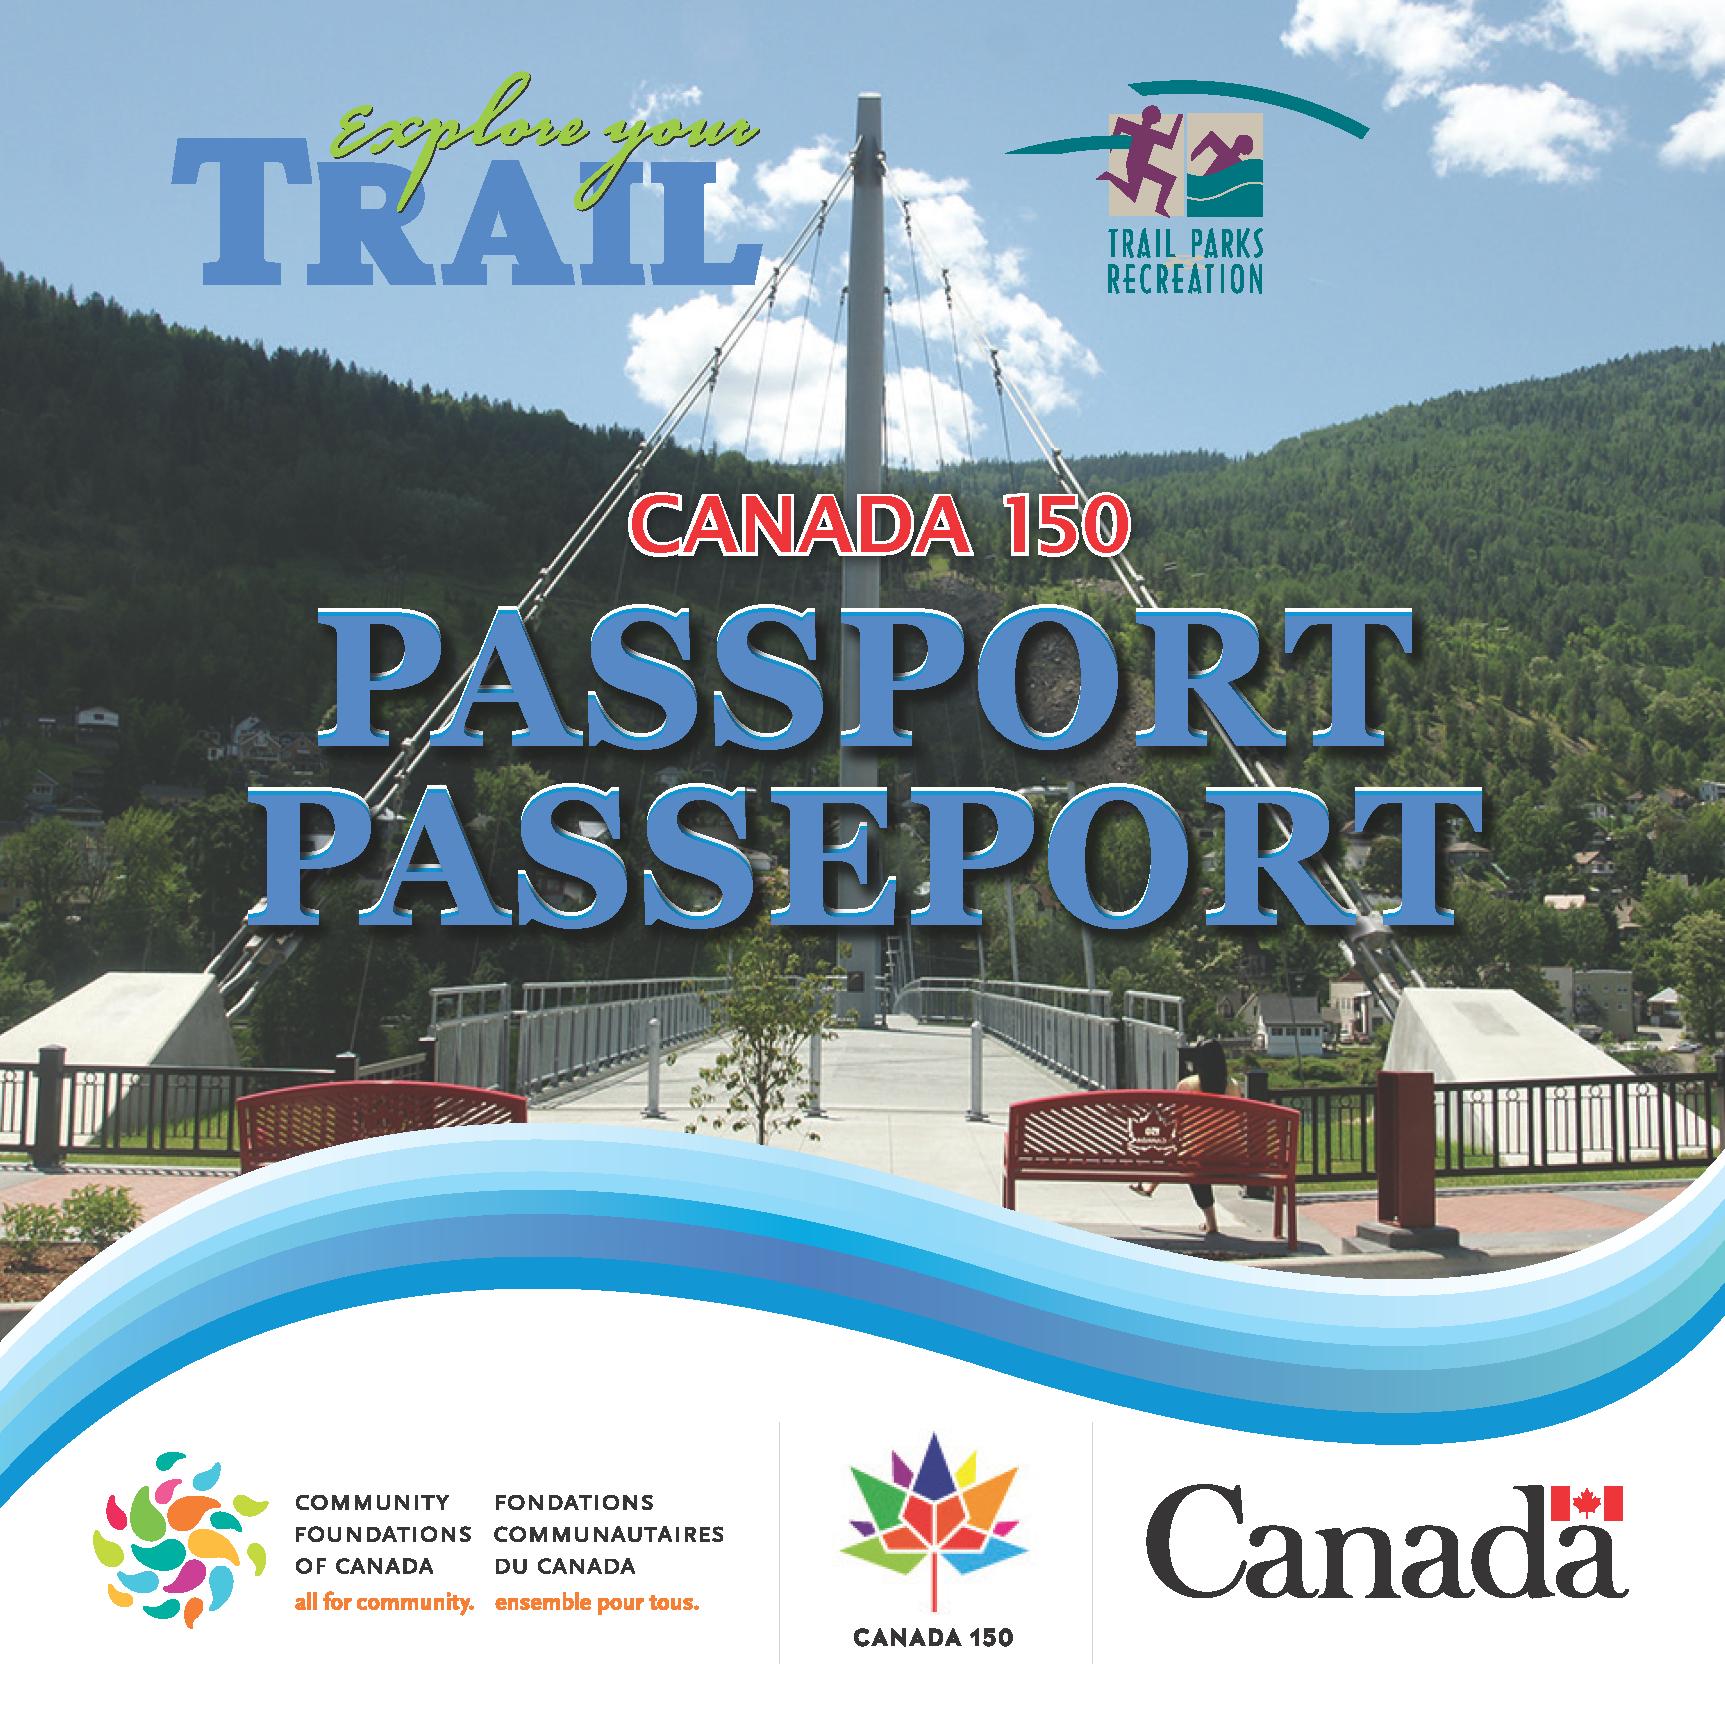 Trail Celebrates Canada 150 Passport